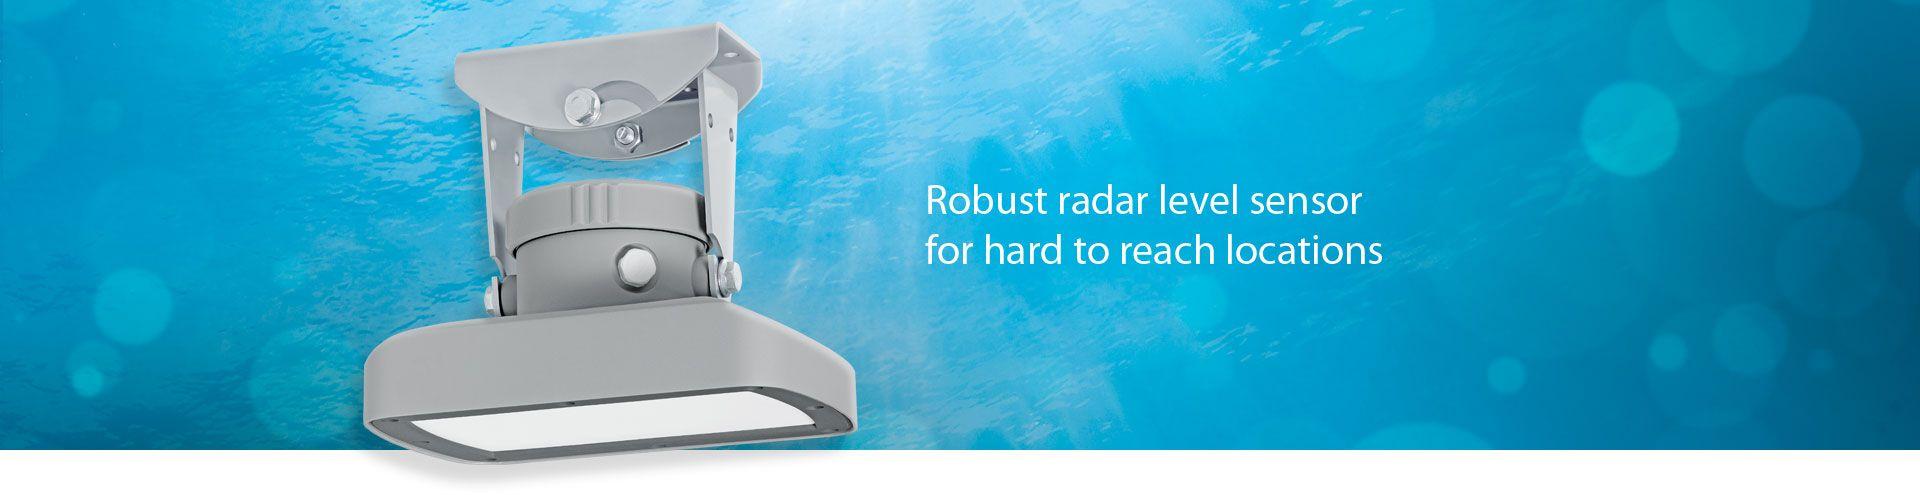 OTT RLS Radar Water Level Sensor